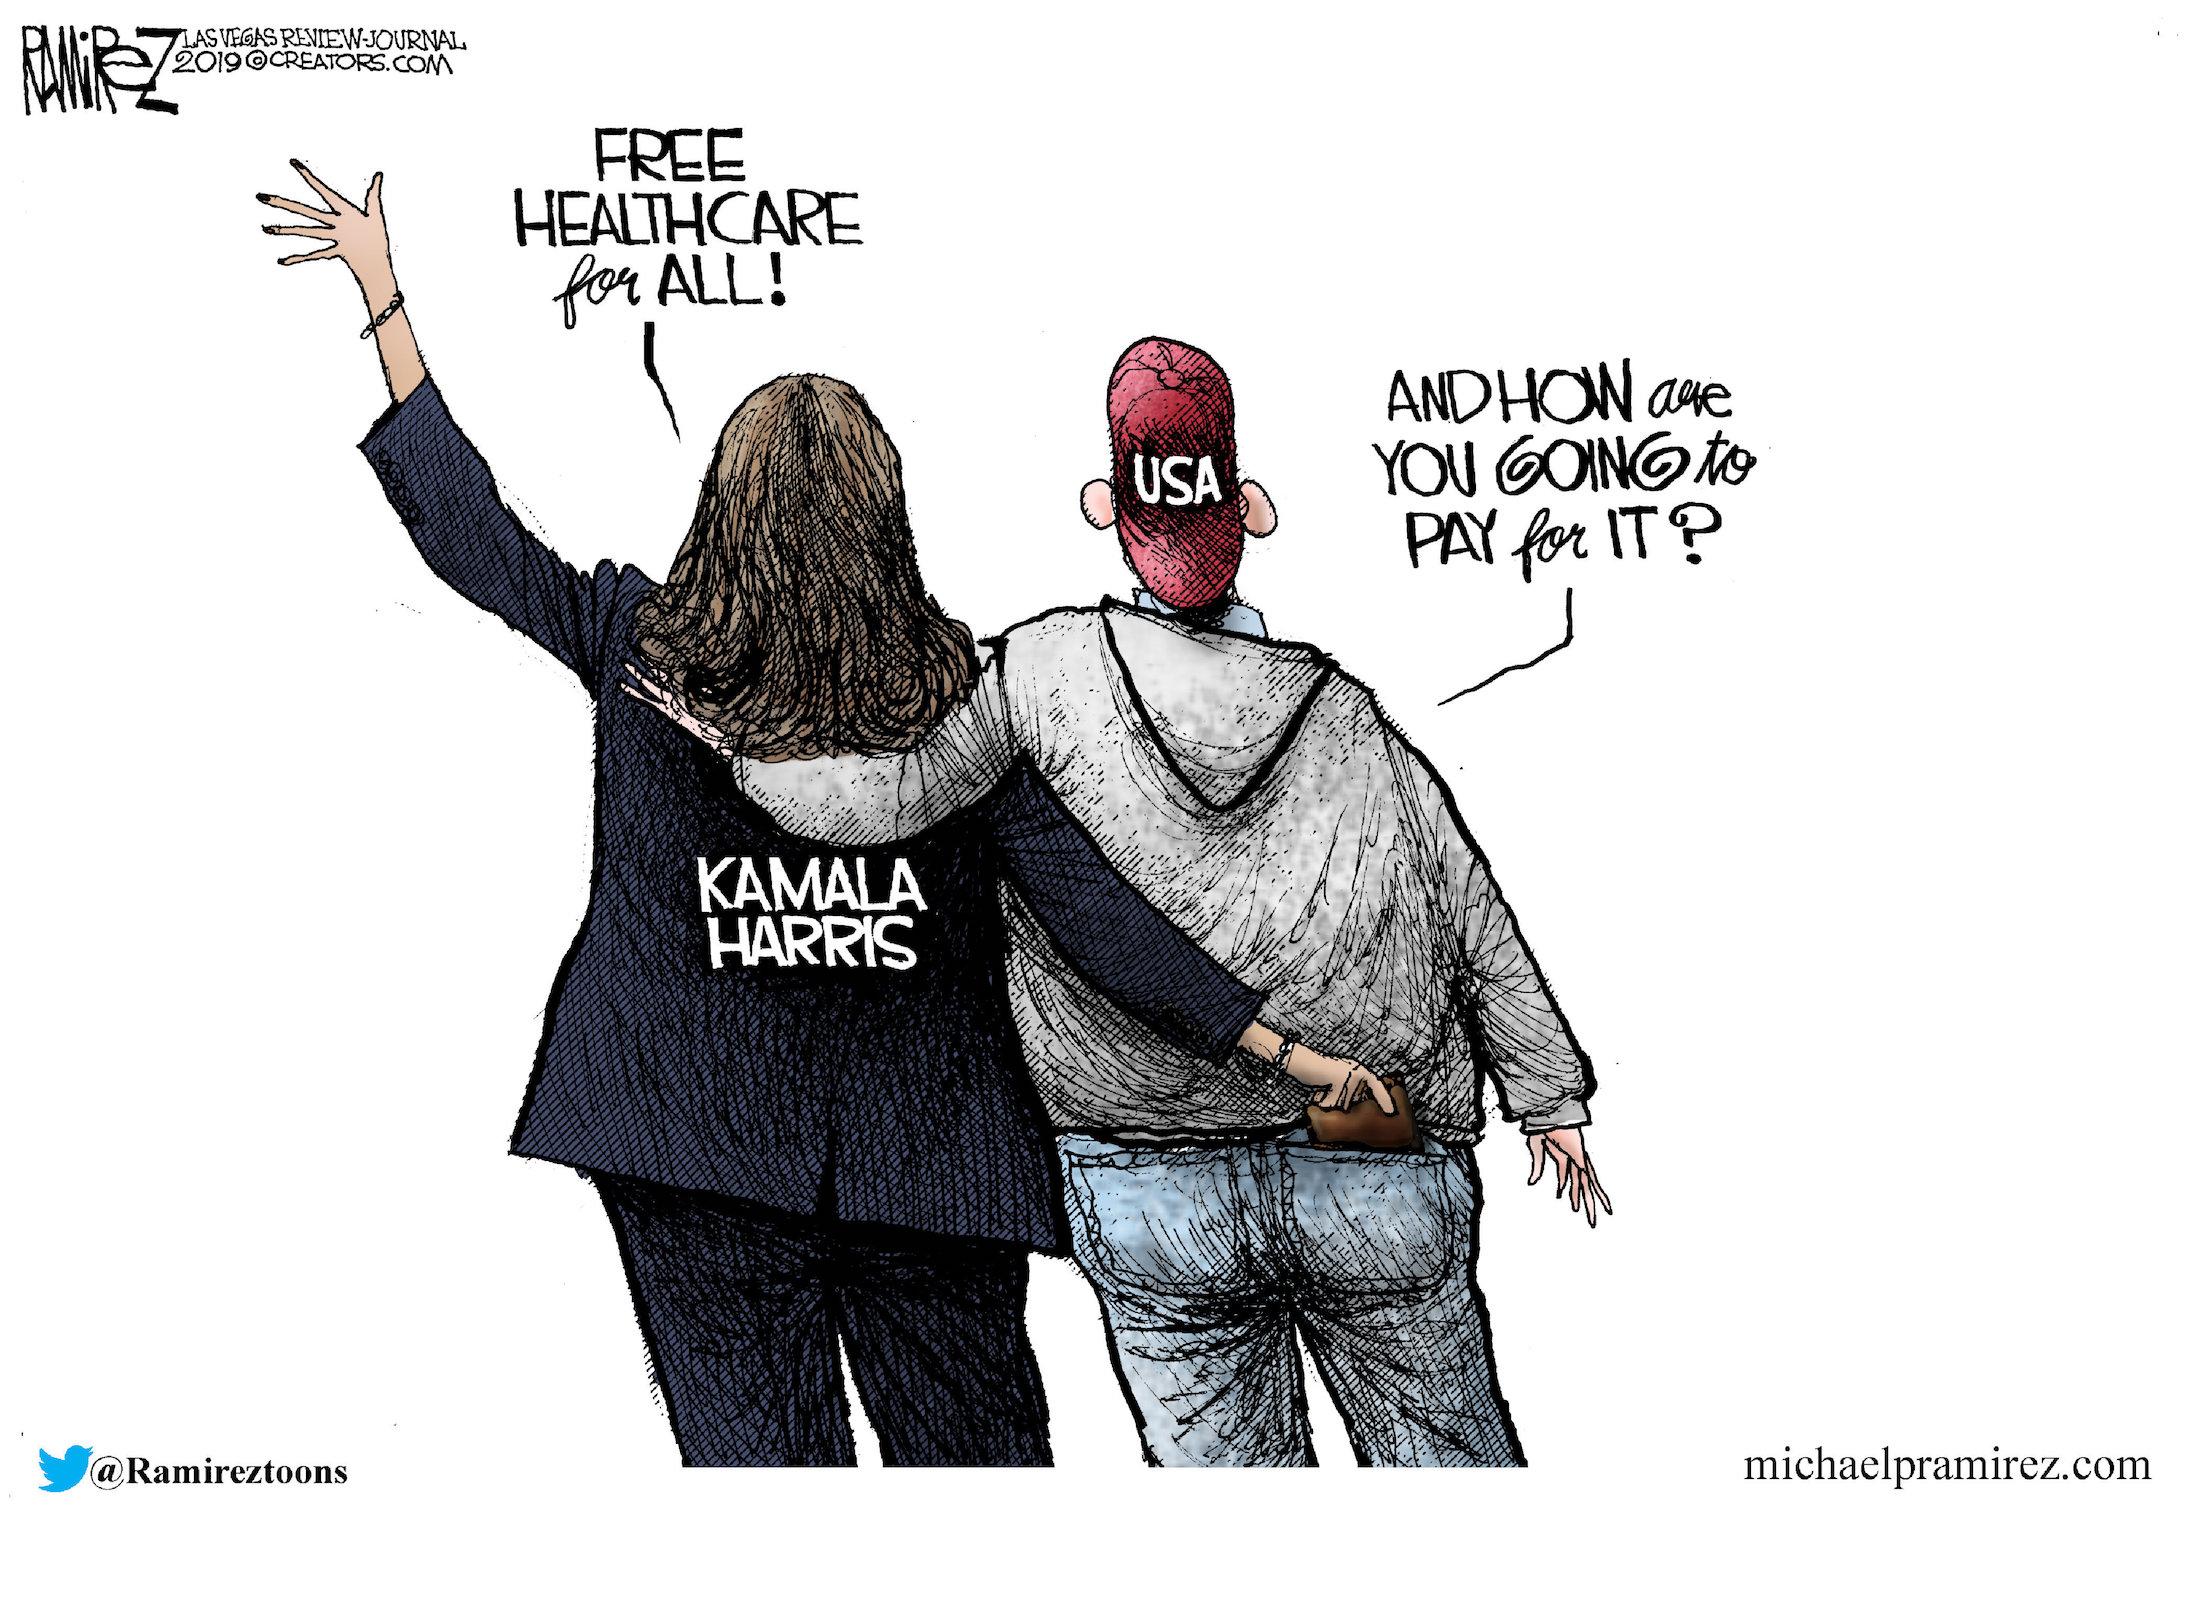 Political Cartoons - Obamacare - Free healthcare for all! - Washington Times